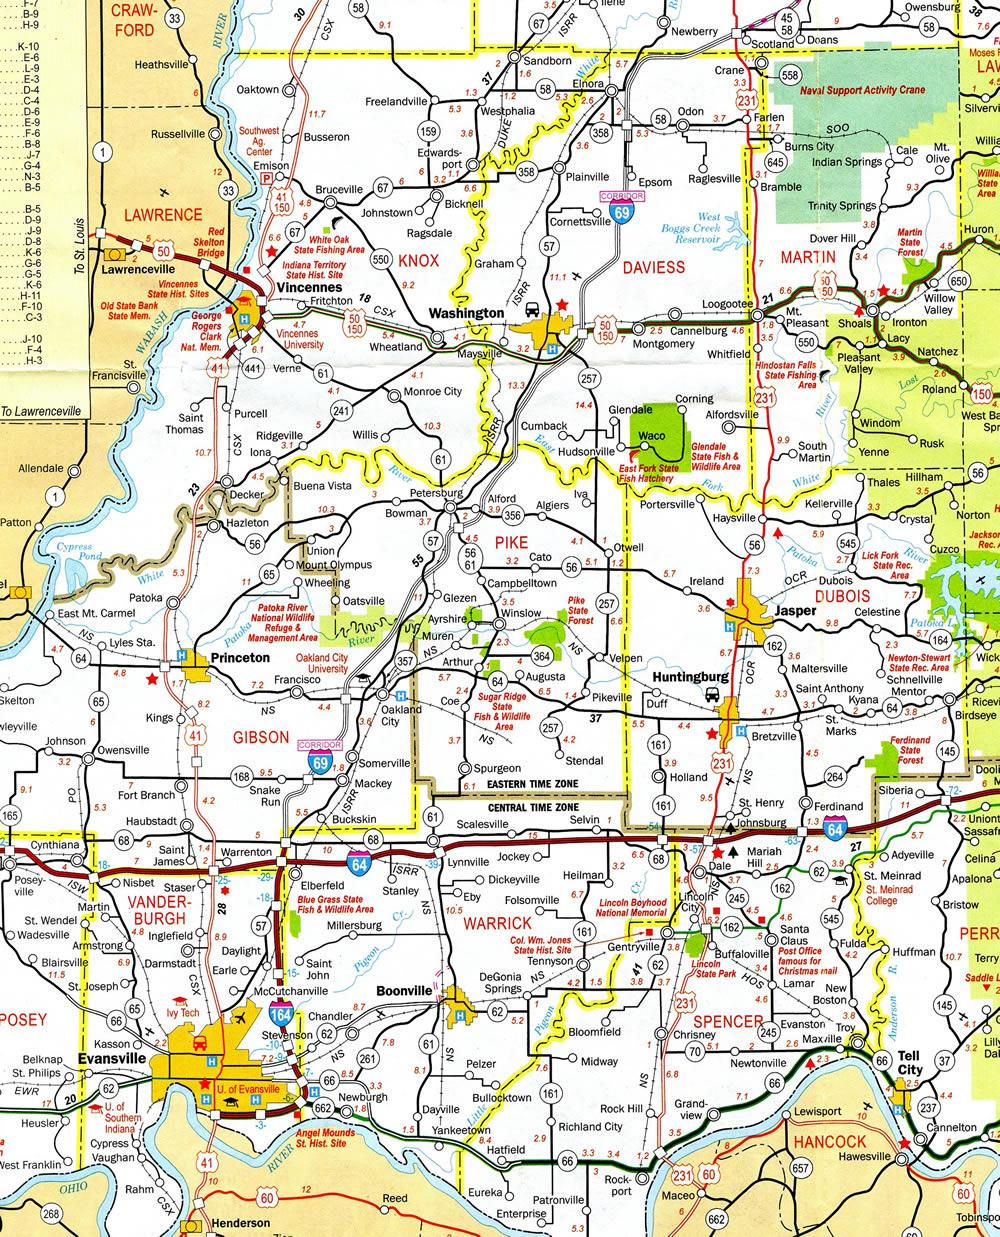 I69 Indiana Map.Interstate 69 Aaroads Indiana